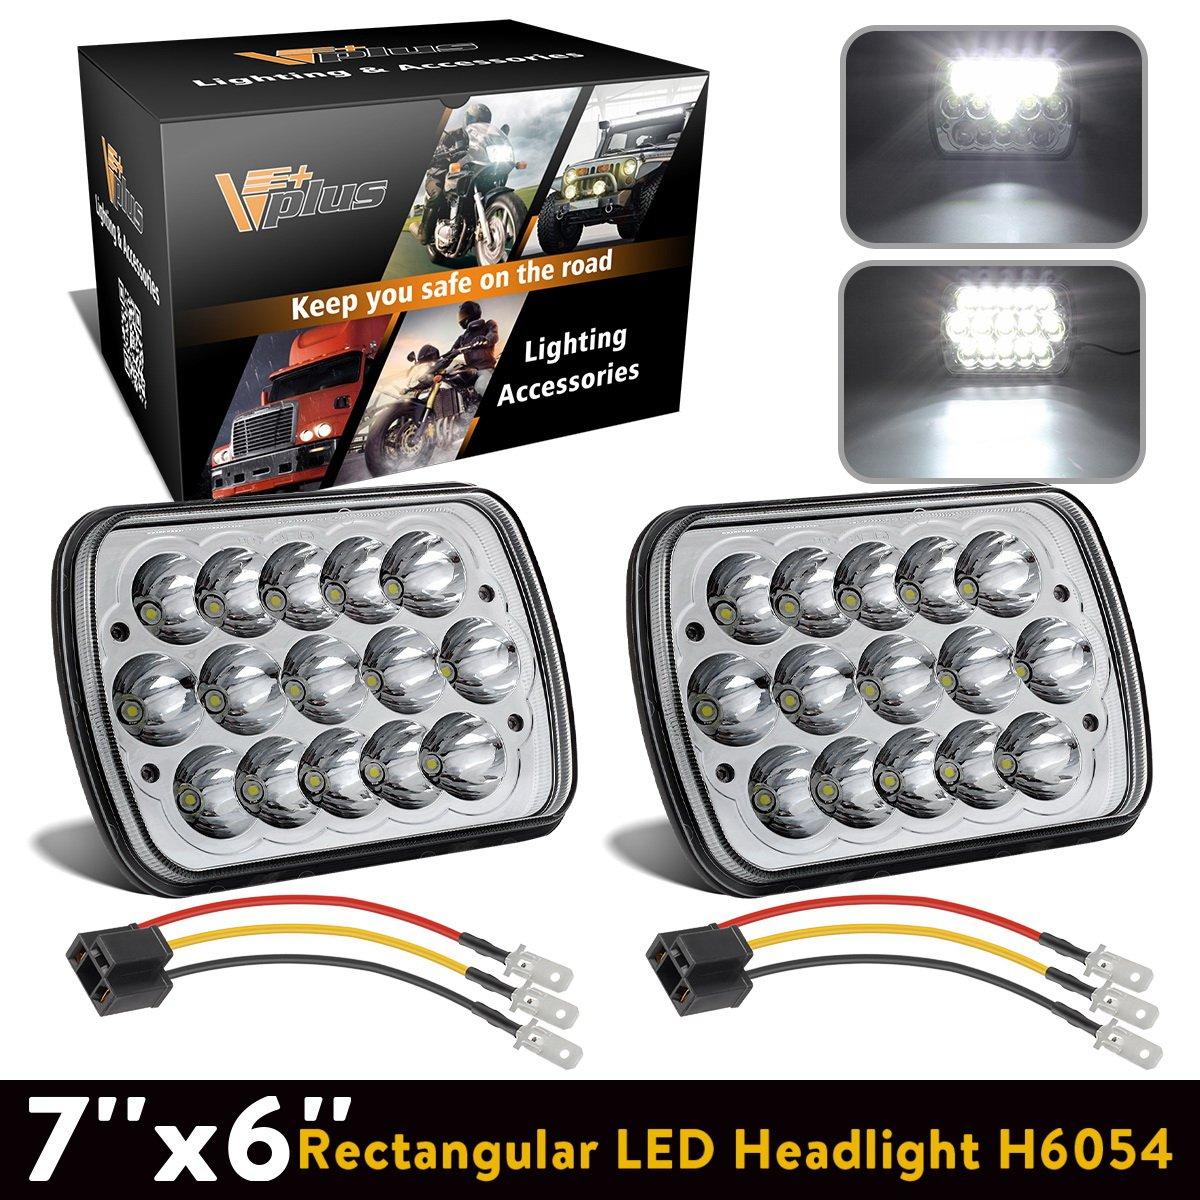 Partsam Sealed Beam Hi Low Cree 7x6 Headlights 6054 Led 77 Silverado Headlight Wiring Harness 5x7 H6054 W H4